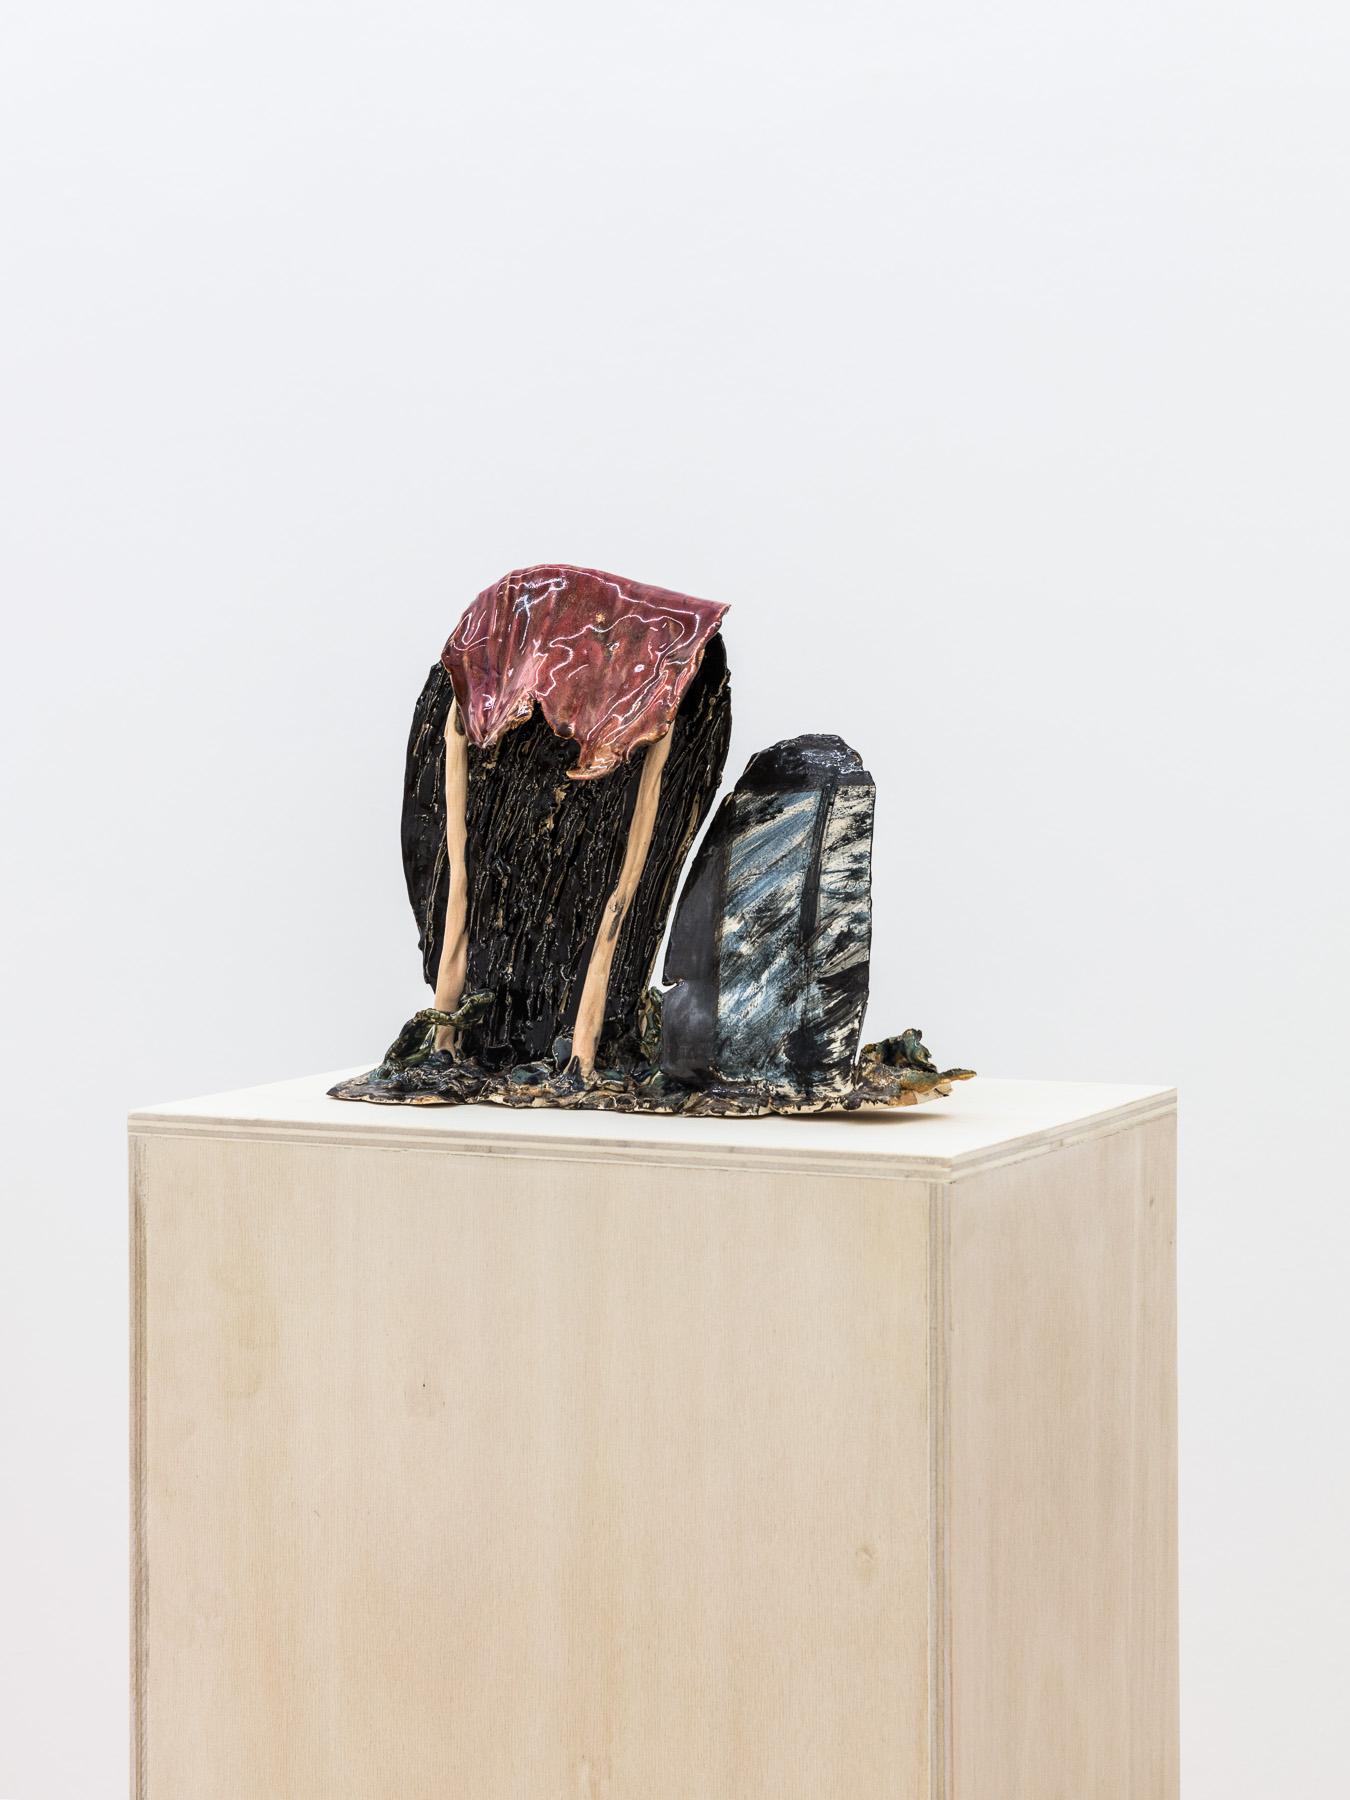 Veronika Hilger, untitled, 2017, ceramic, glazed, 22,2 x 27 x 11,7 cm